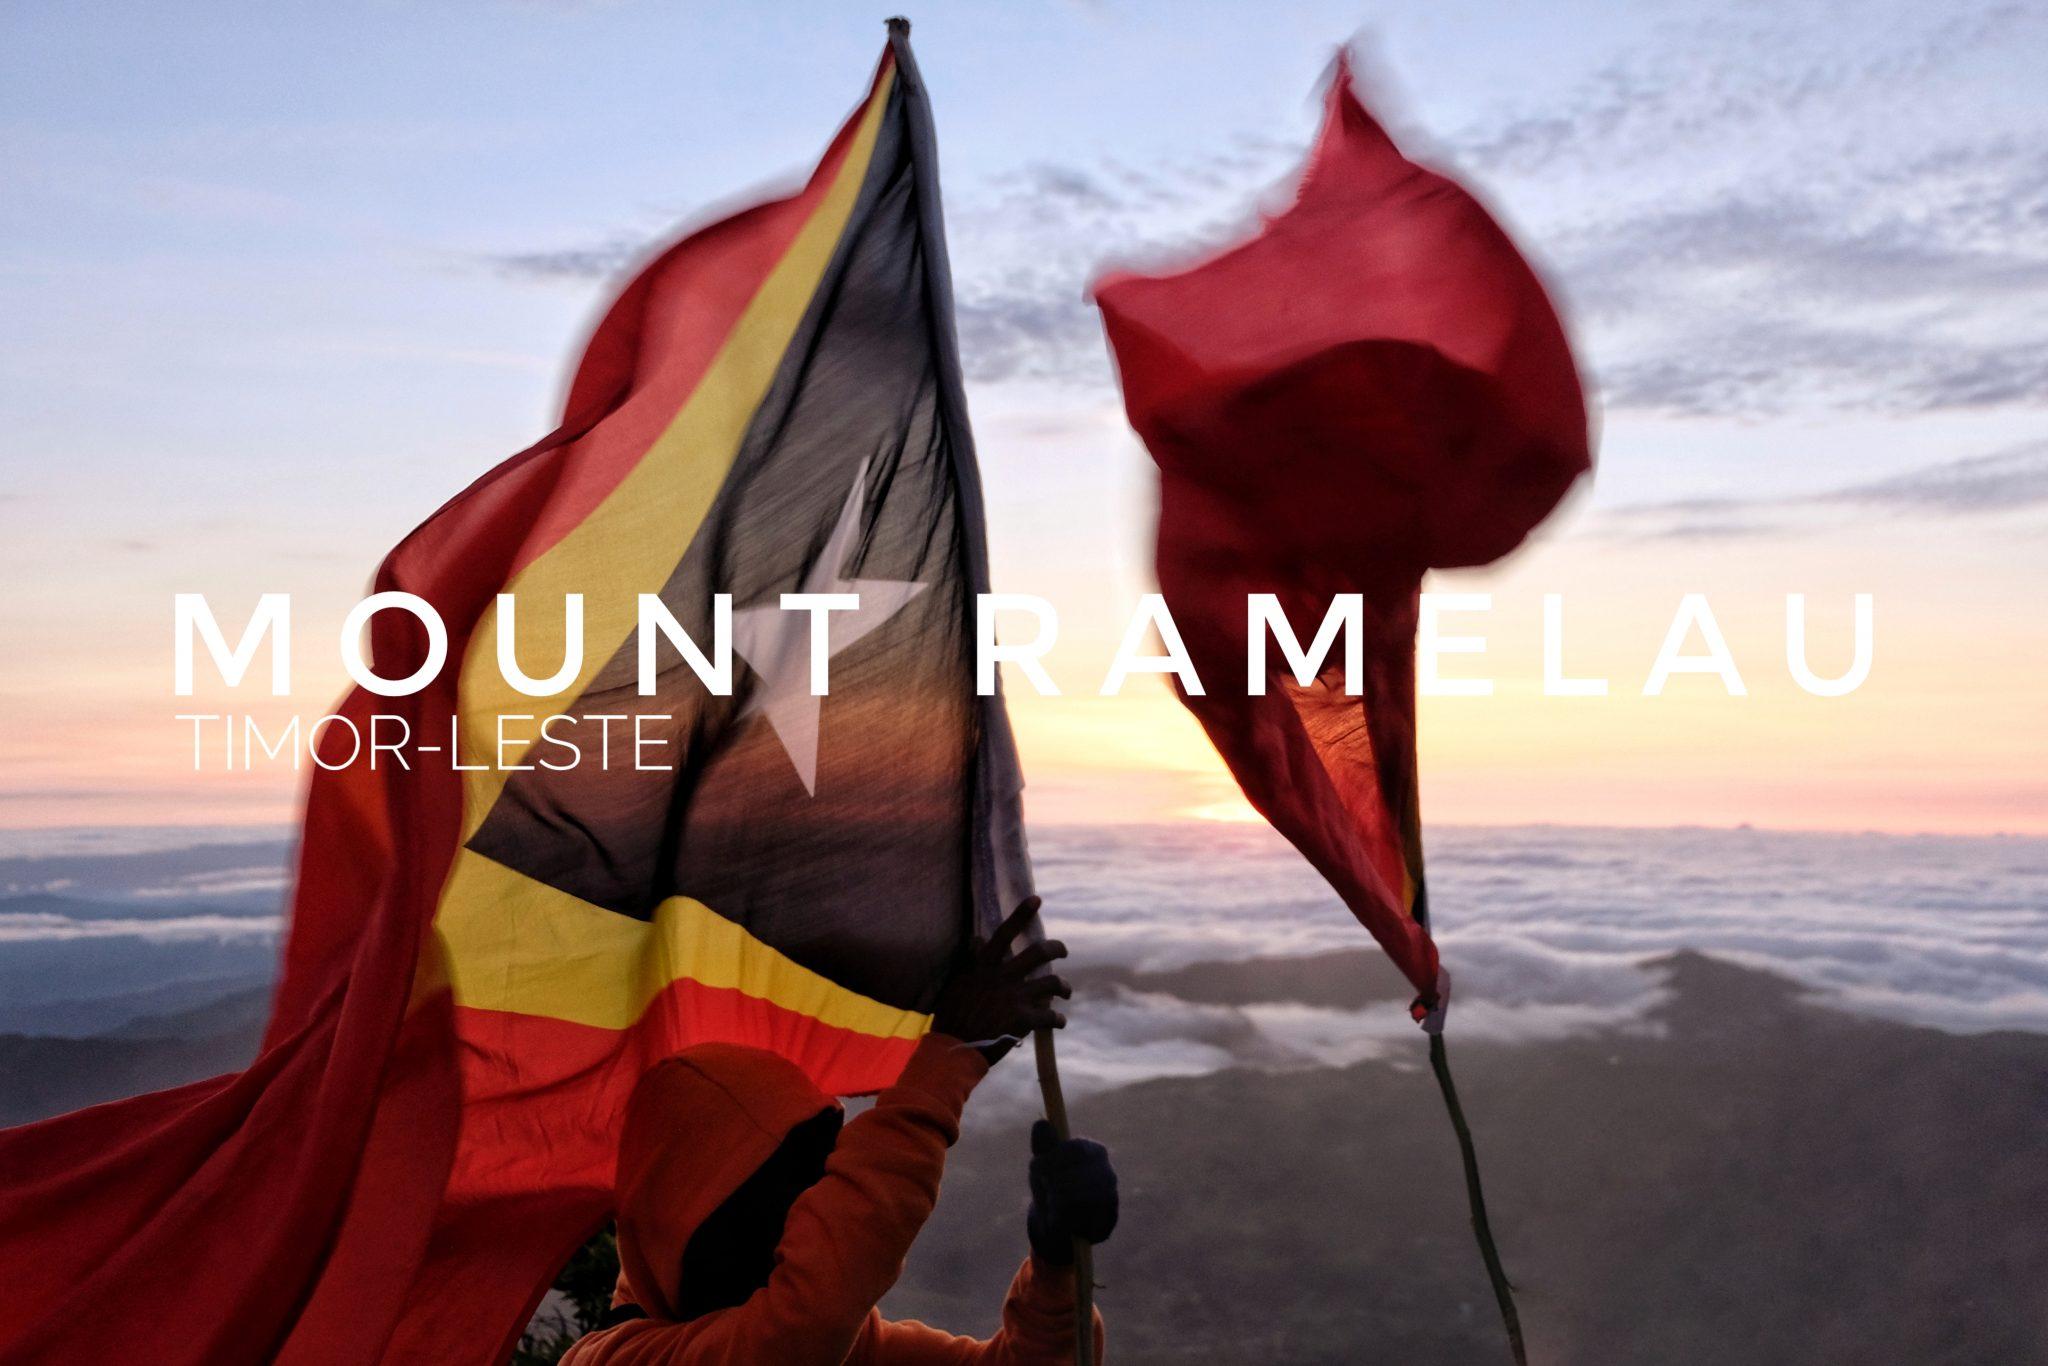 Climbing Mount Ramelau, Timor-Leste